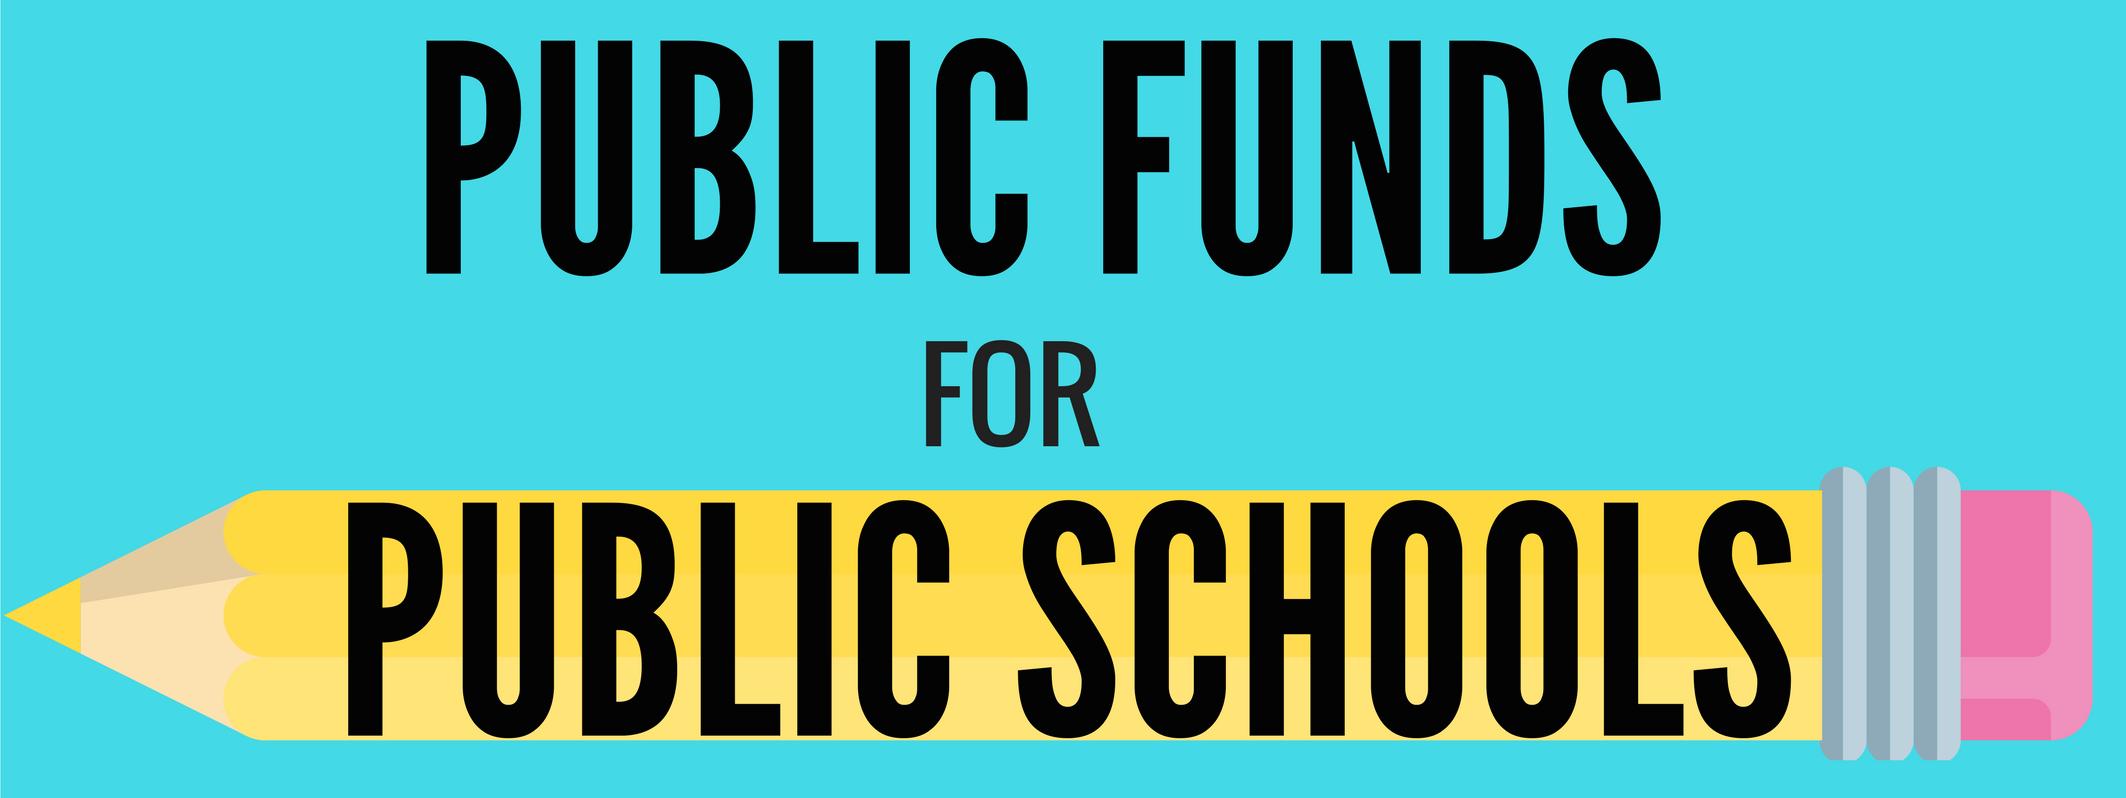 Public_Funds_4_Public_Schools_3.png